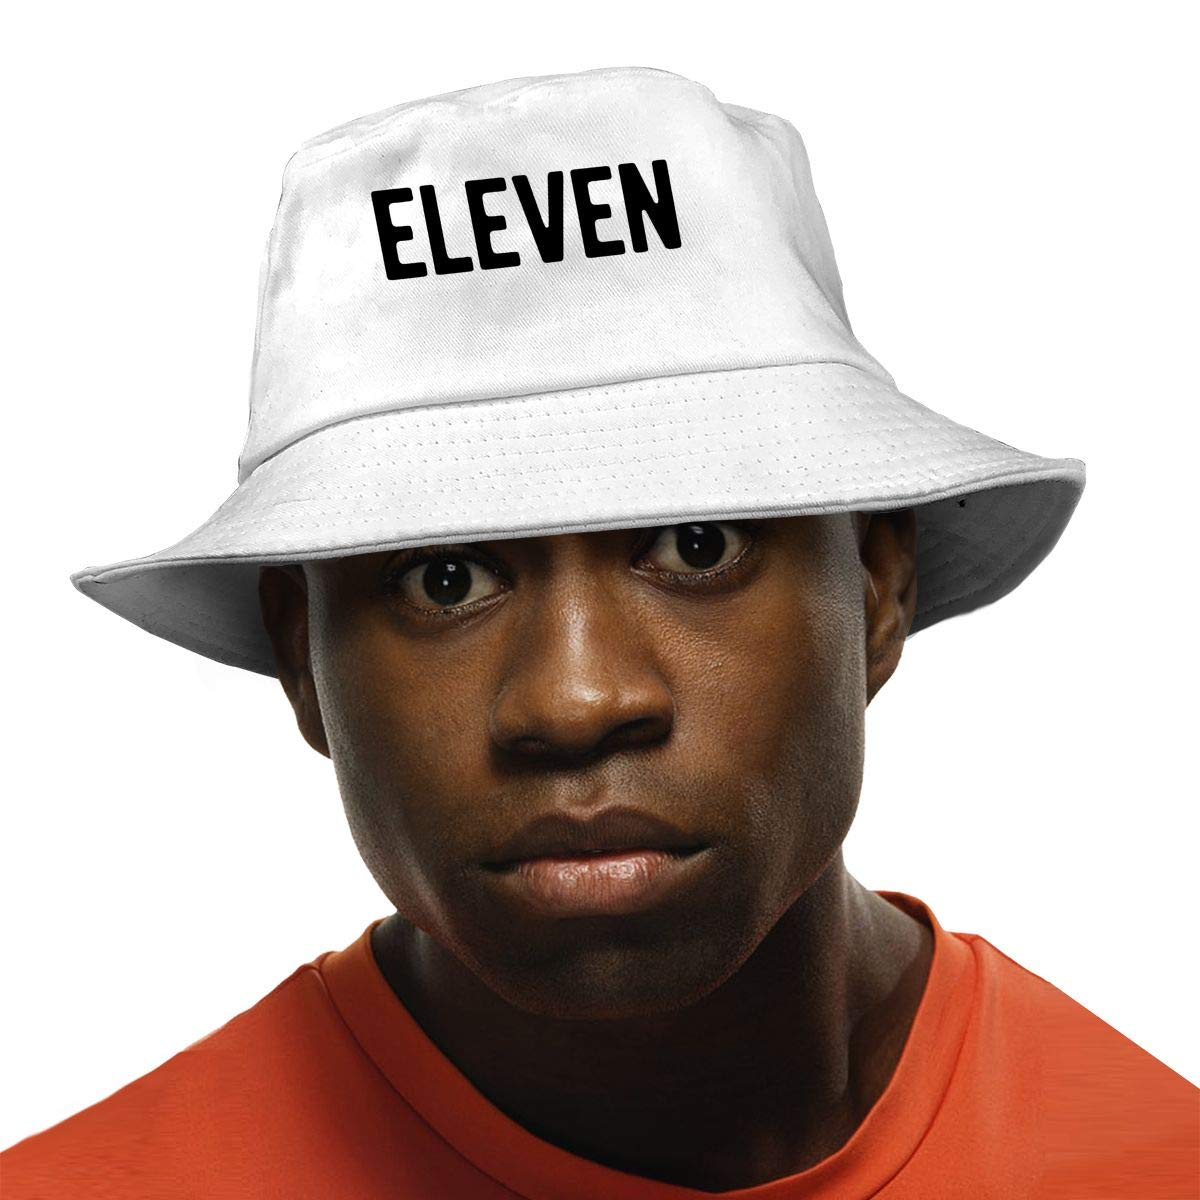 PPAN Eleven Unisex Cotton Packable White Travel Bucket Hat Fishing Cap